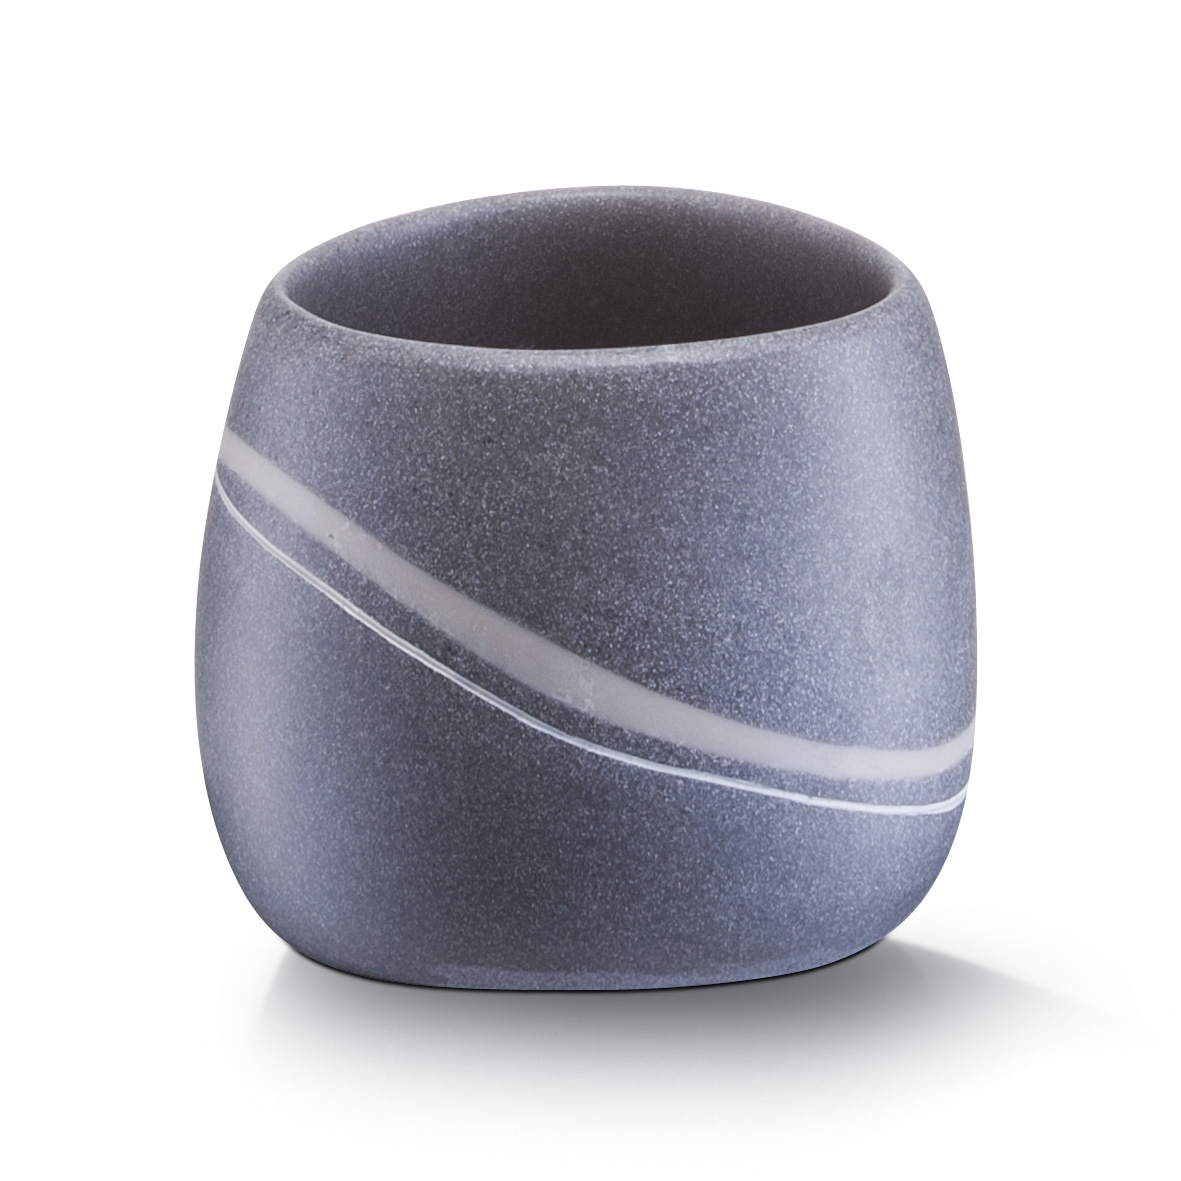 Pahar pentru periuta din polirasina, Stonefinish, l9,9xA9,2xH8,7 cm poza